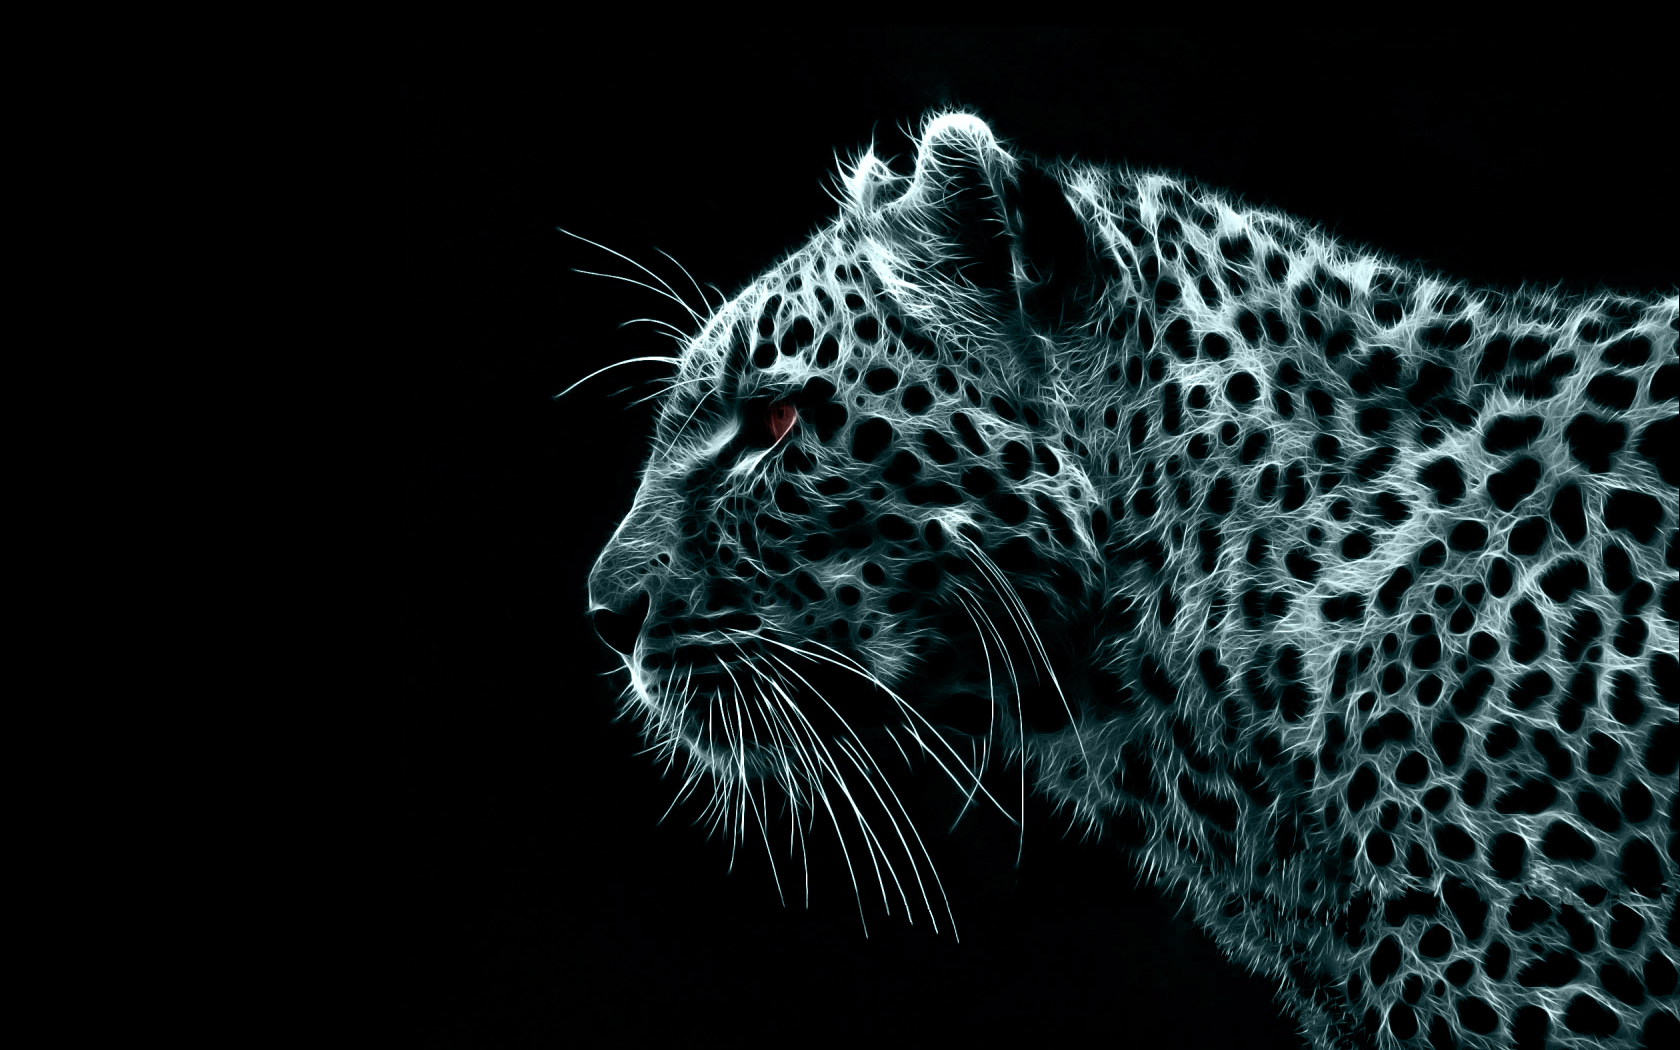 Animal - Artistic  Wallpaper